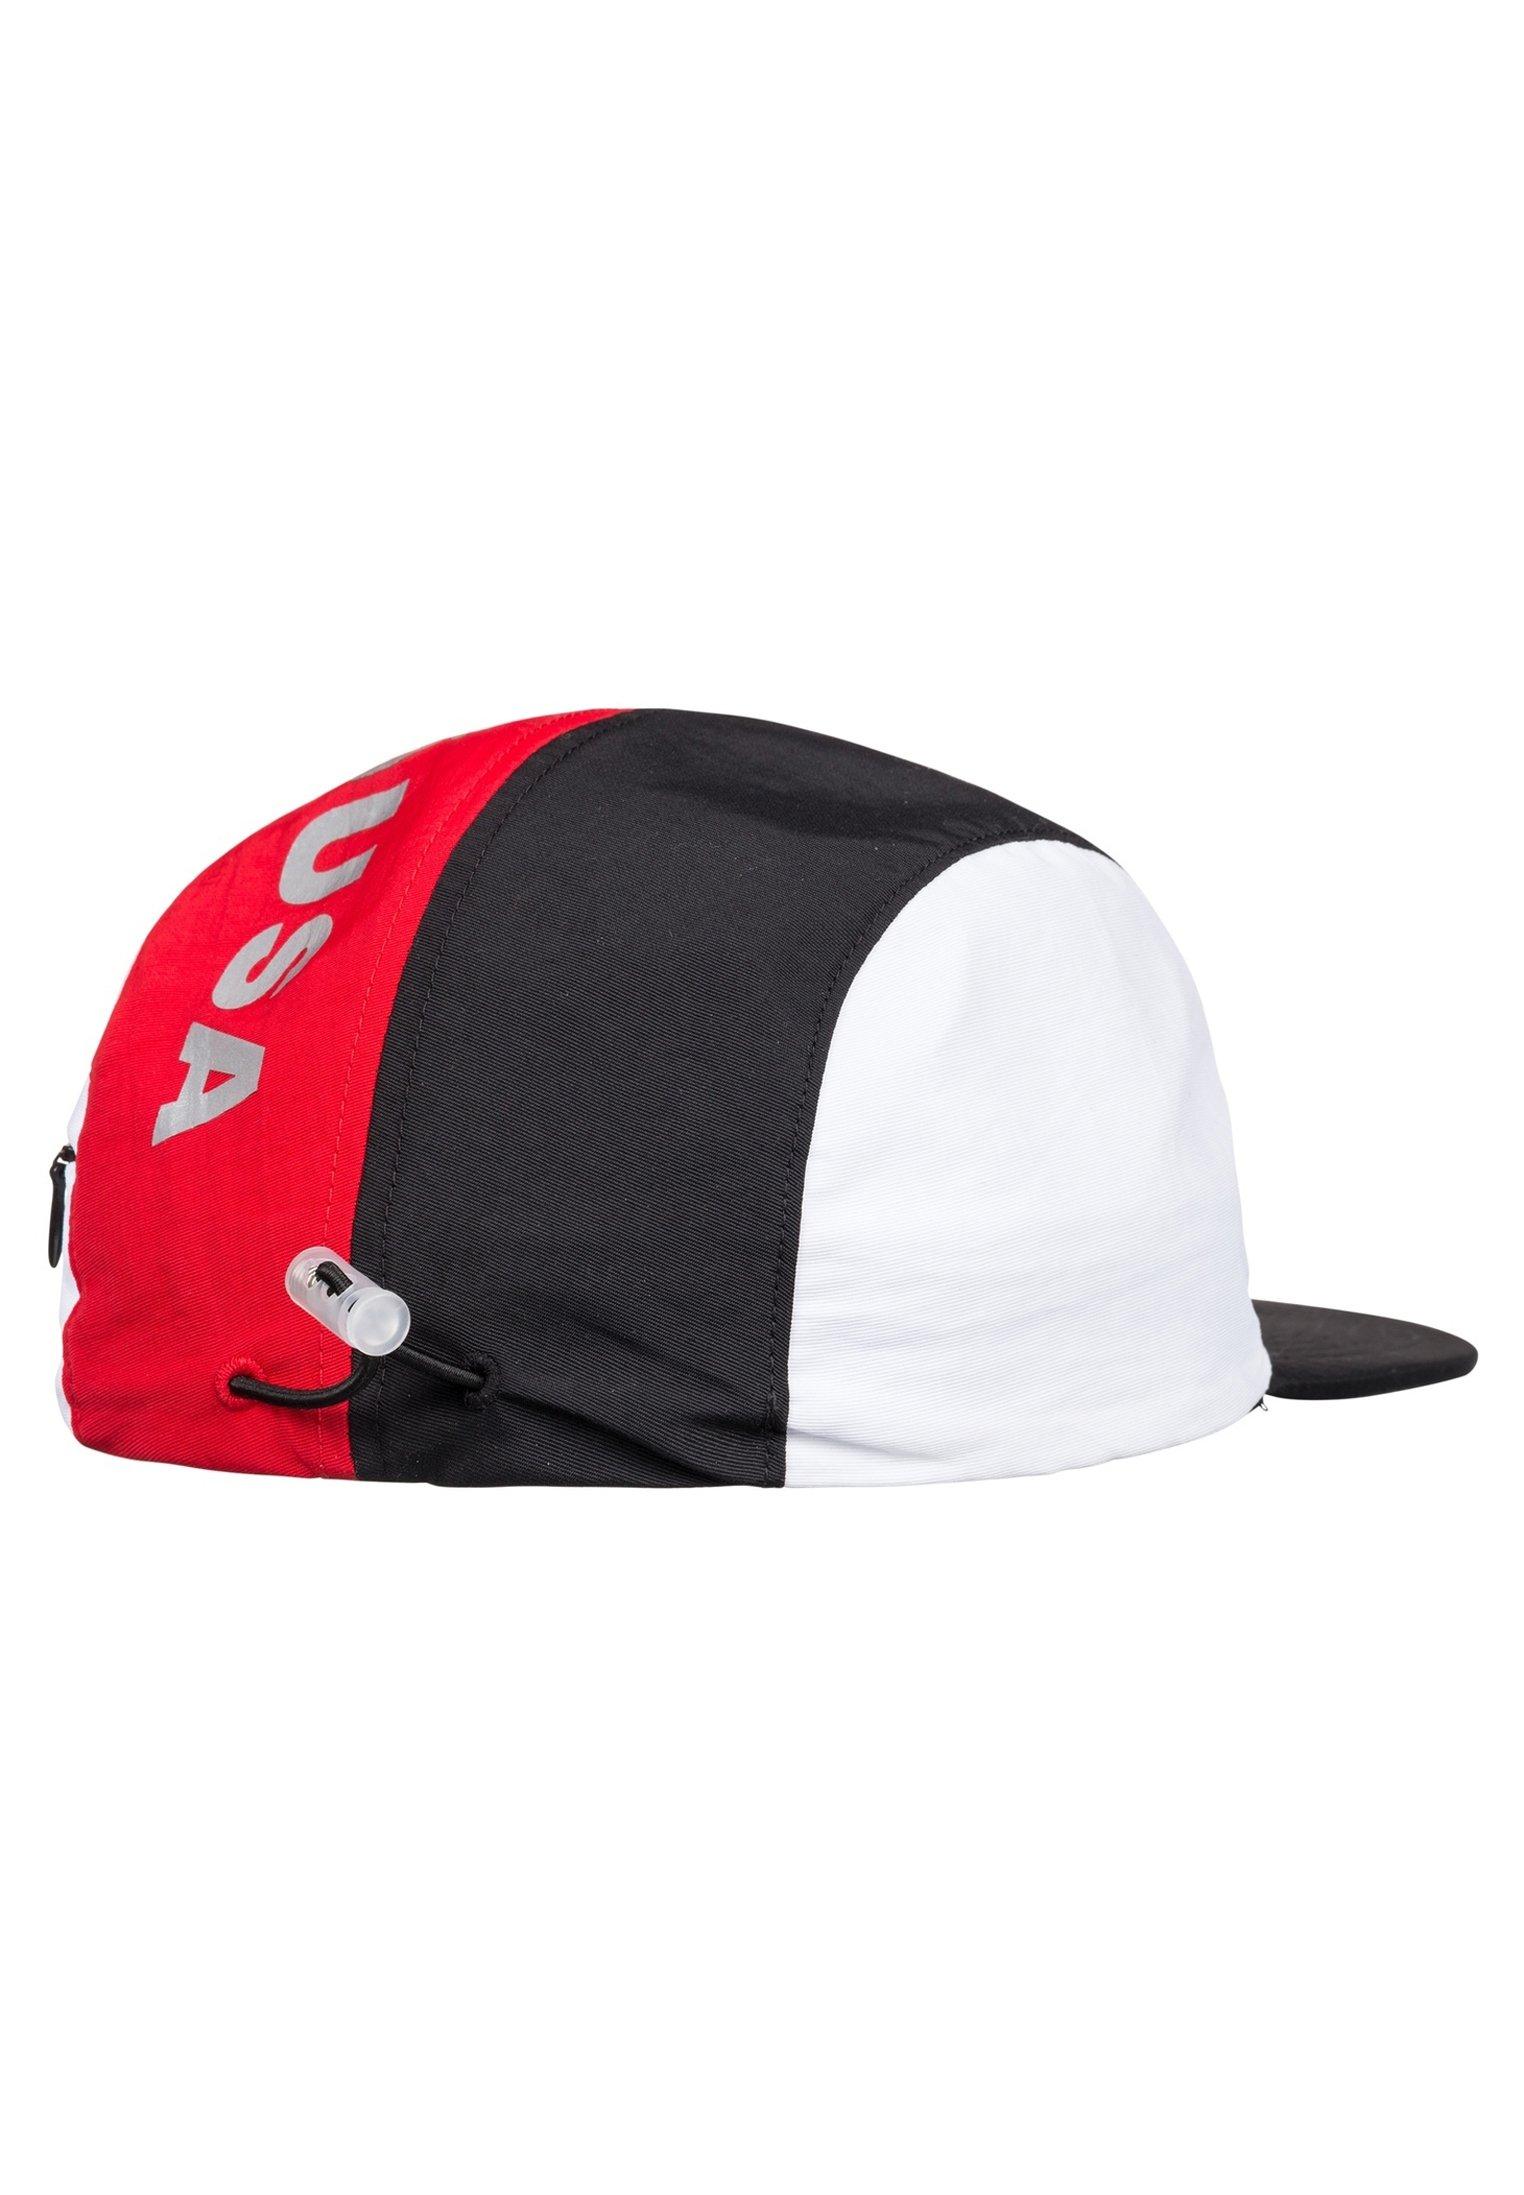 Dc Shoes Camper - Cap Black/red/white/schwarz